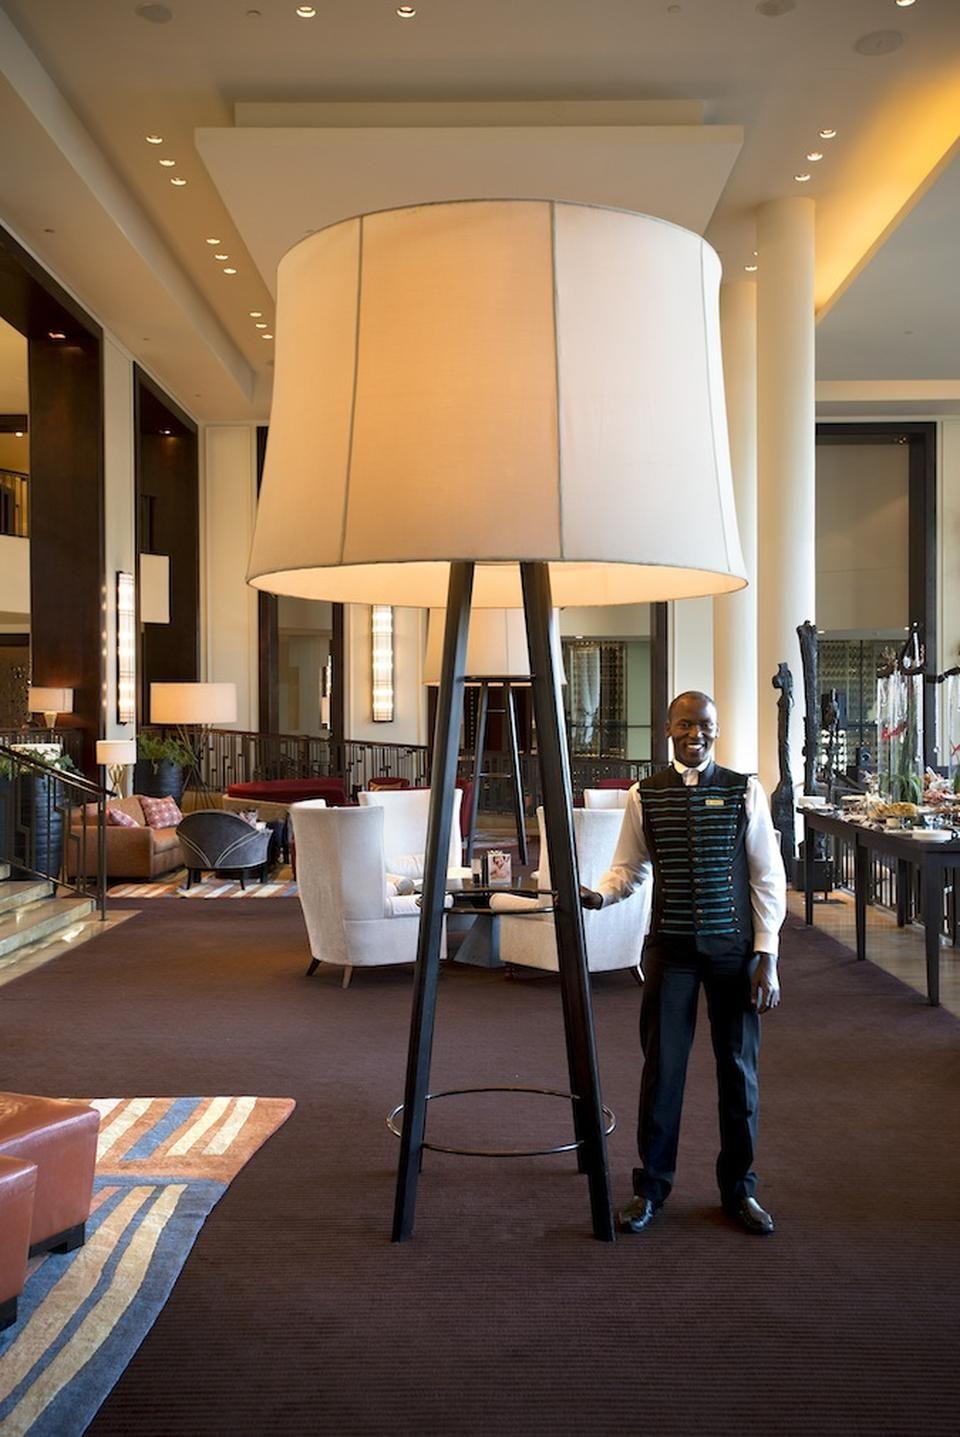 T L' Definitive Guide Cape Town Hotels